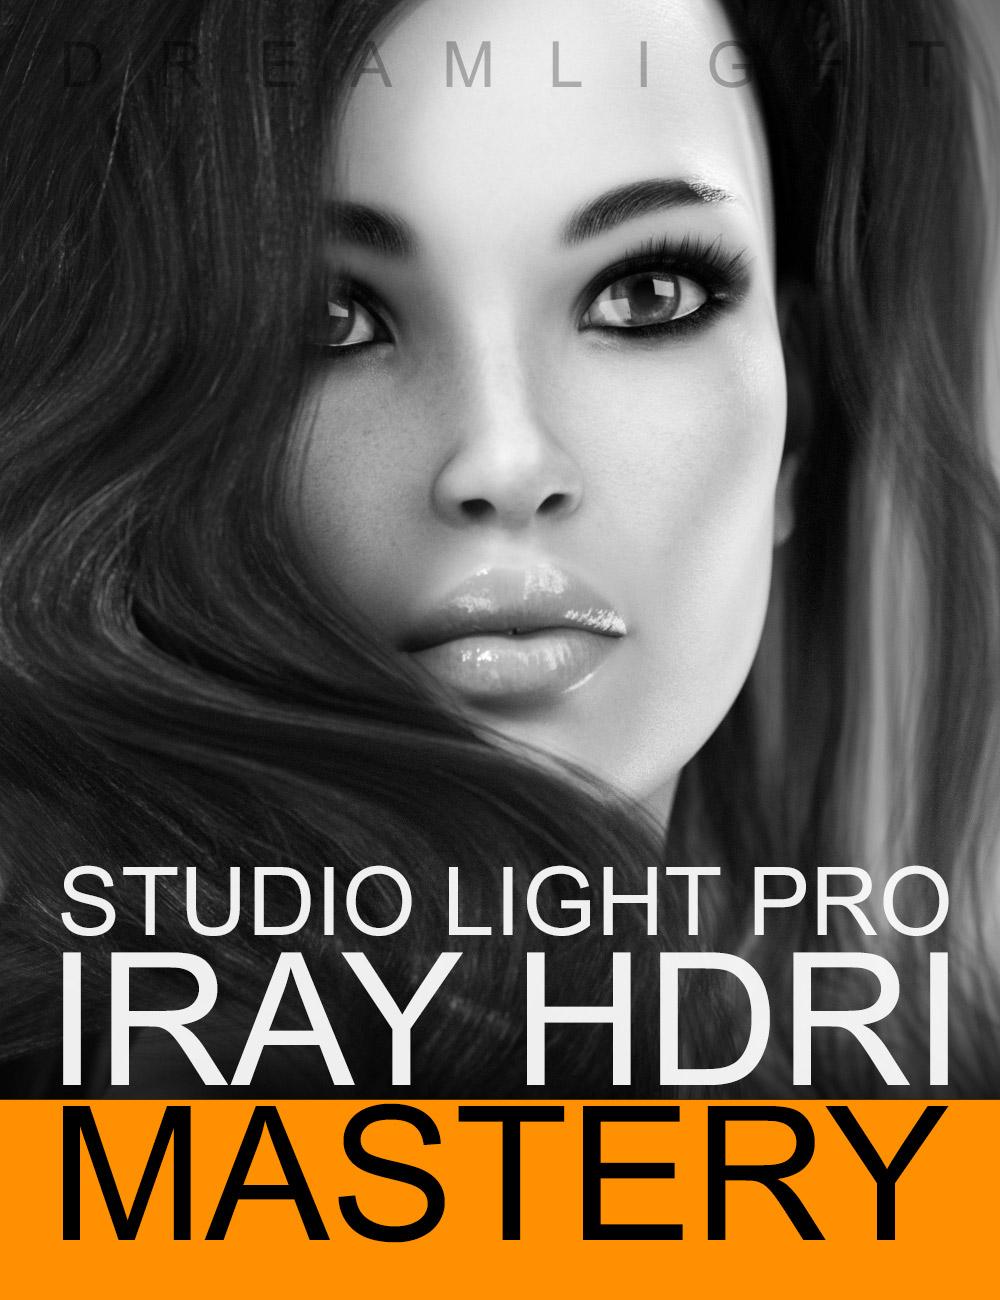 SLP Iray HDRI Mastery by: Dreamlight, 3D Models by Daz 3D